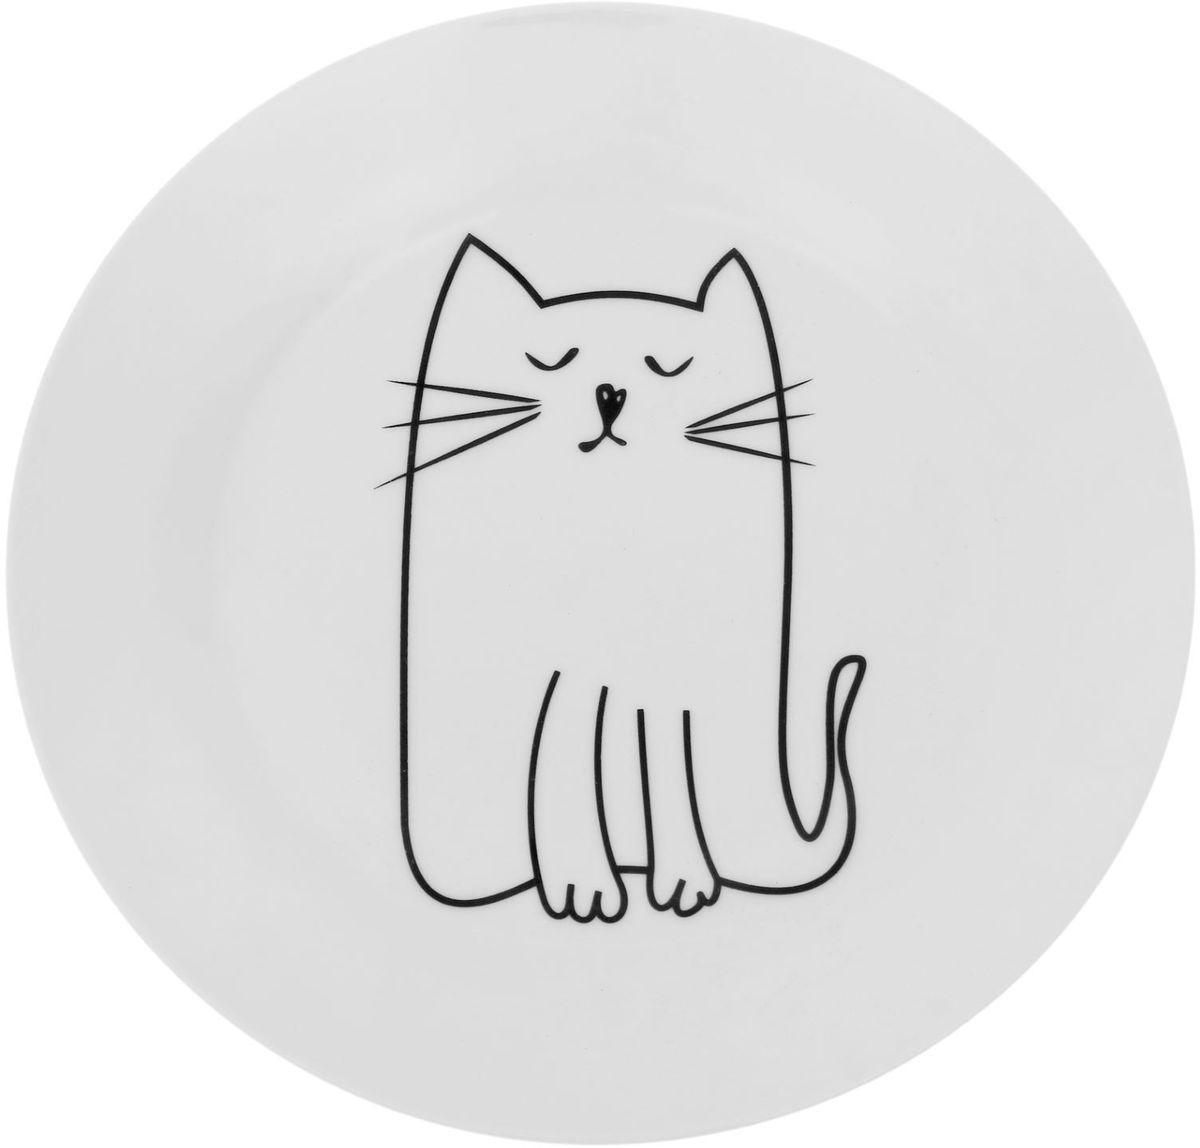 Тарелка Сотвори чудо Киска, диаметр 23 см